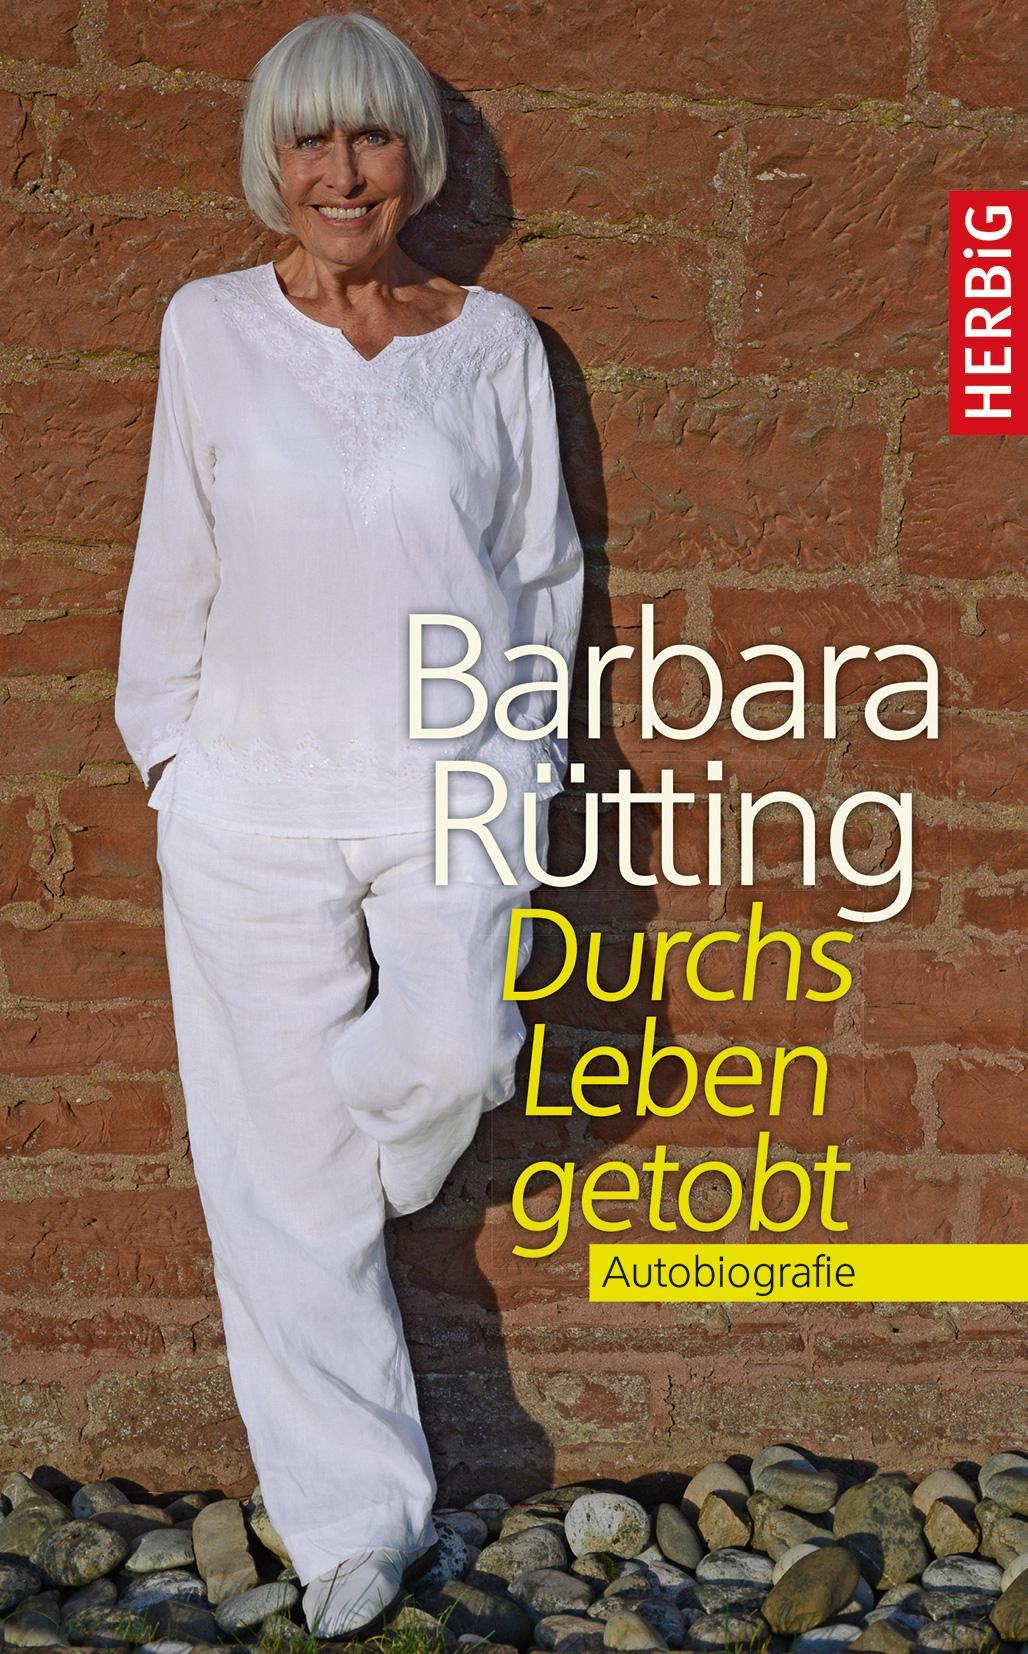 Durchs Leben getobt Barbara Rütting